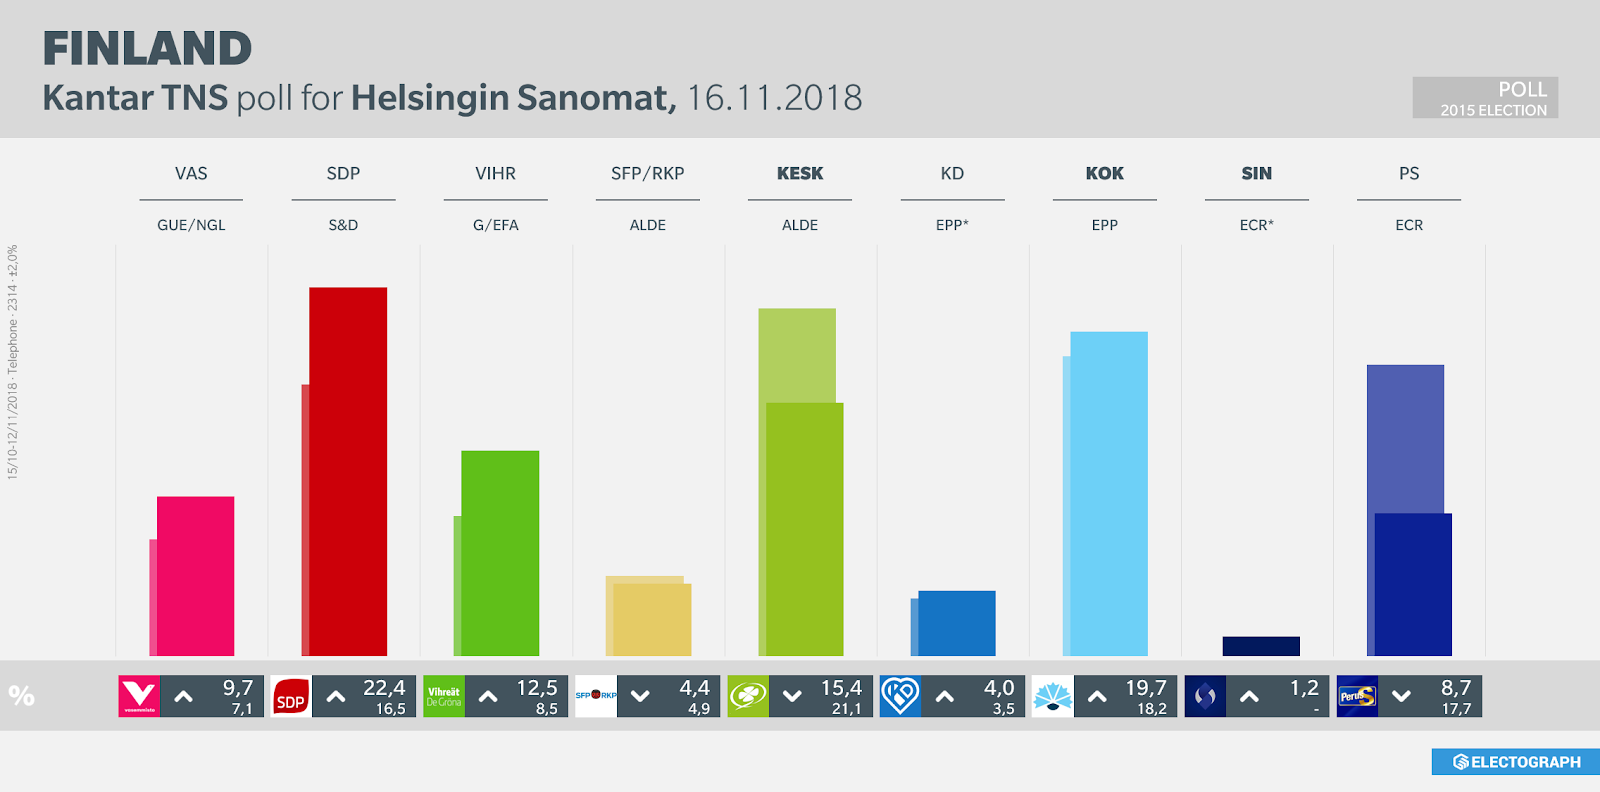 FINLAND: Kantar TNS poll chart for Helsingin Sanomat, November 2018